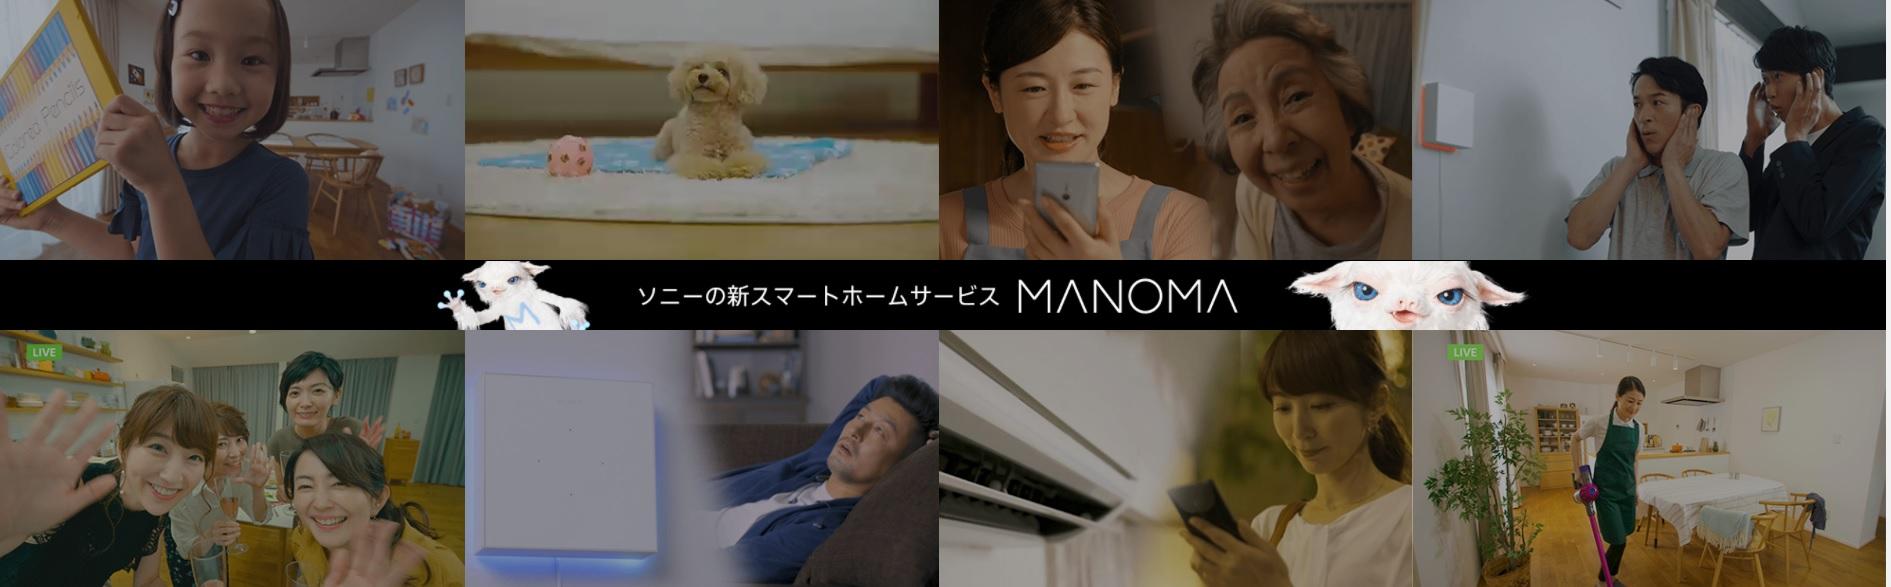 MANOMA画像1